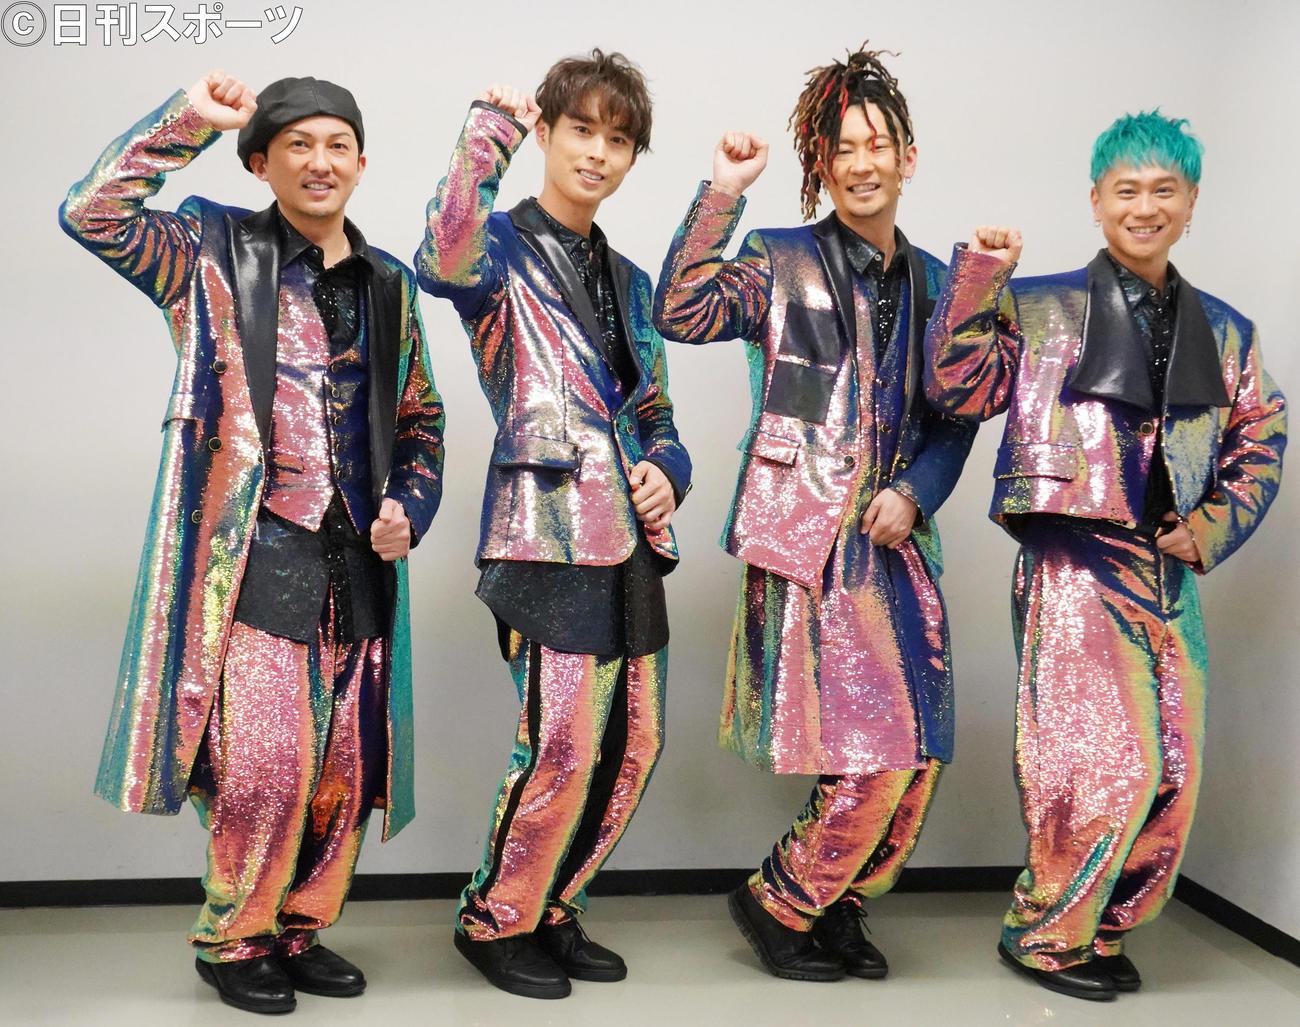 「LIVE DA PUMP 2020Funky Tricky Party FINAL」の本番前に新ダンス「つり革ダンス」を披露する、左からISSA、YORI、TOMO、KIMI(撮影・佐藤成)